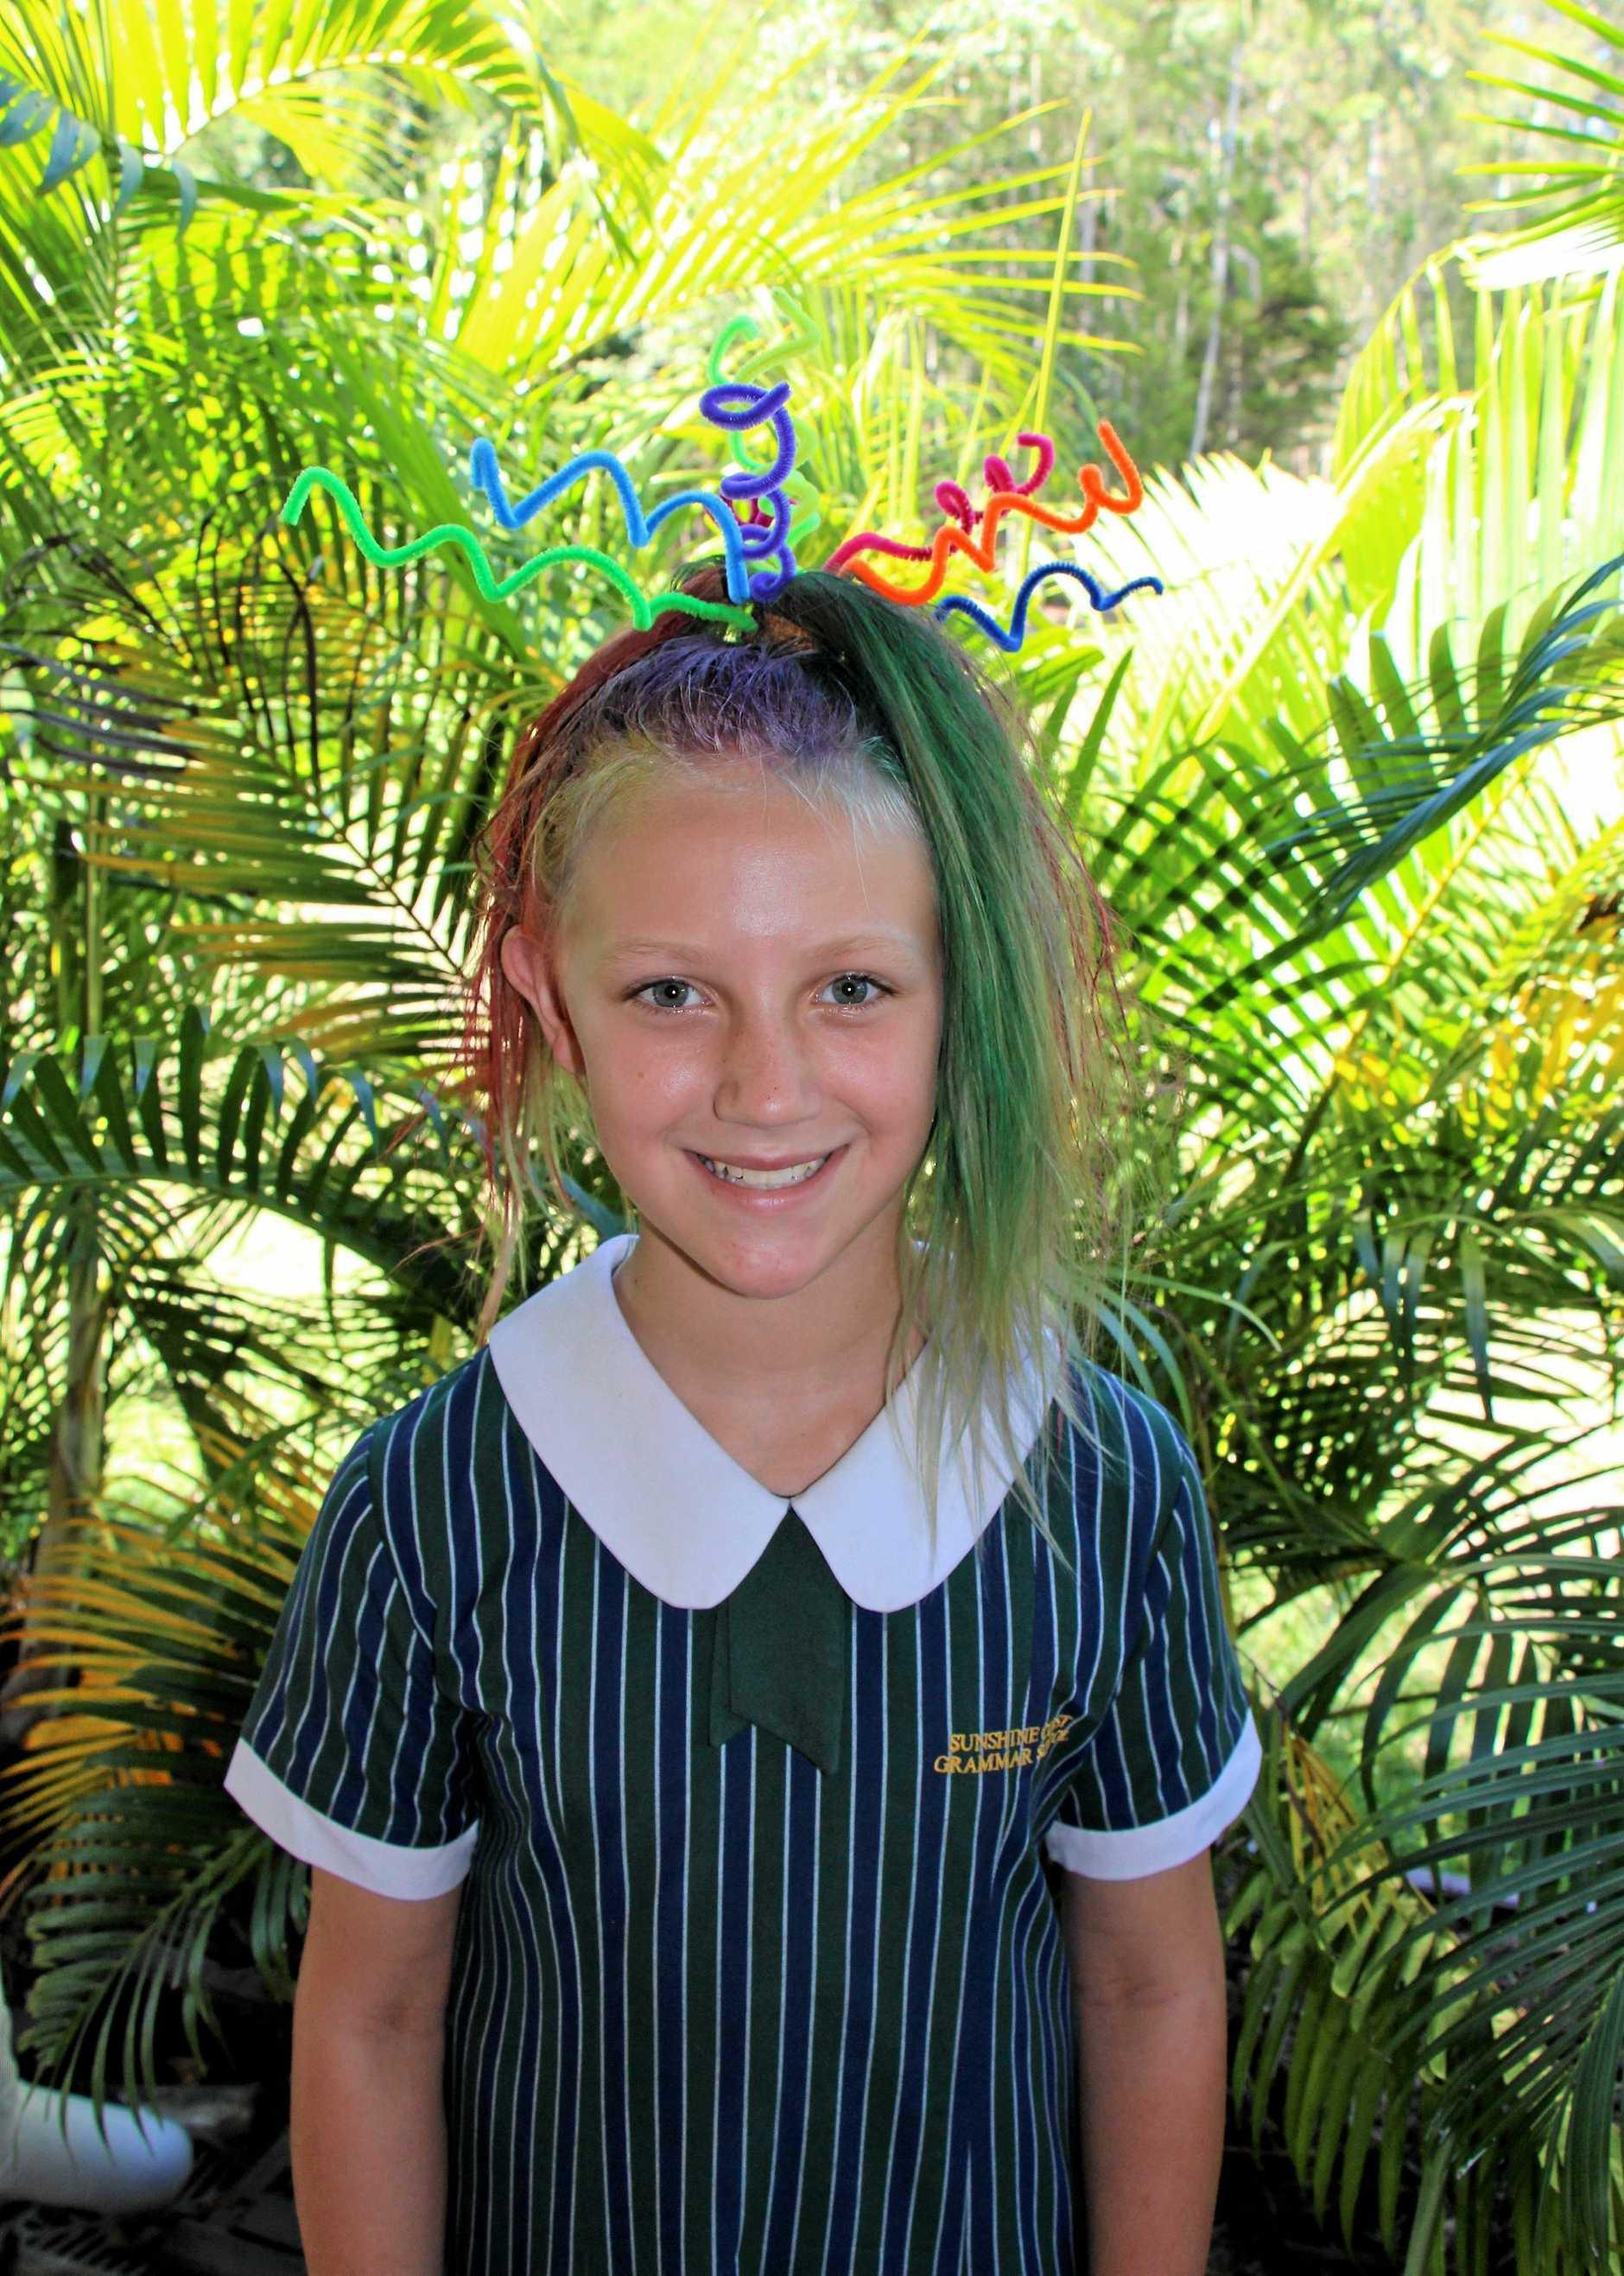 Sunshine Coast Grammar student Bella Morris with a full head of hair.